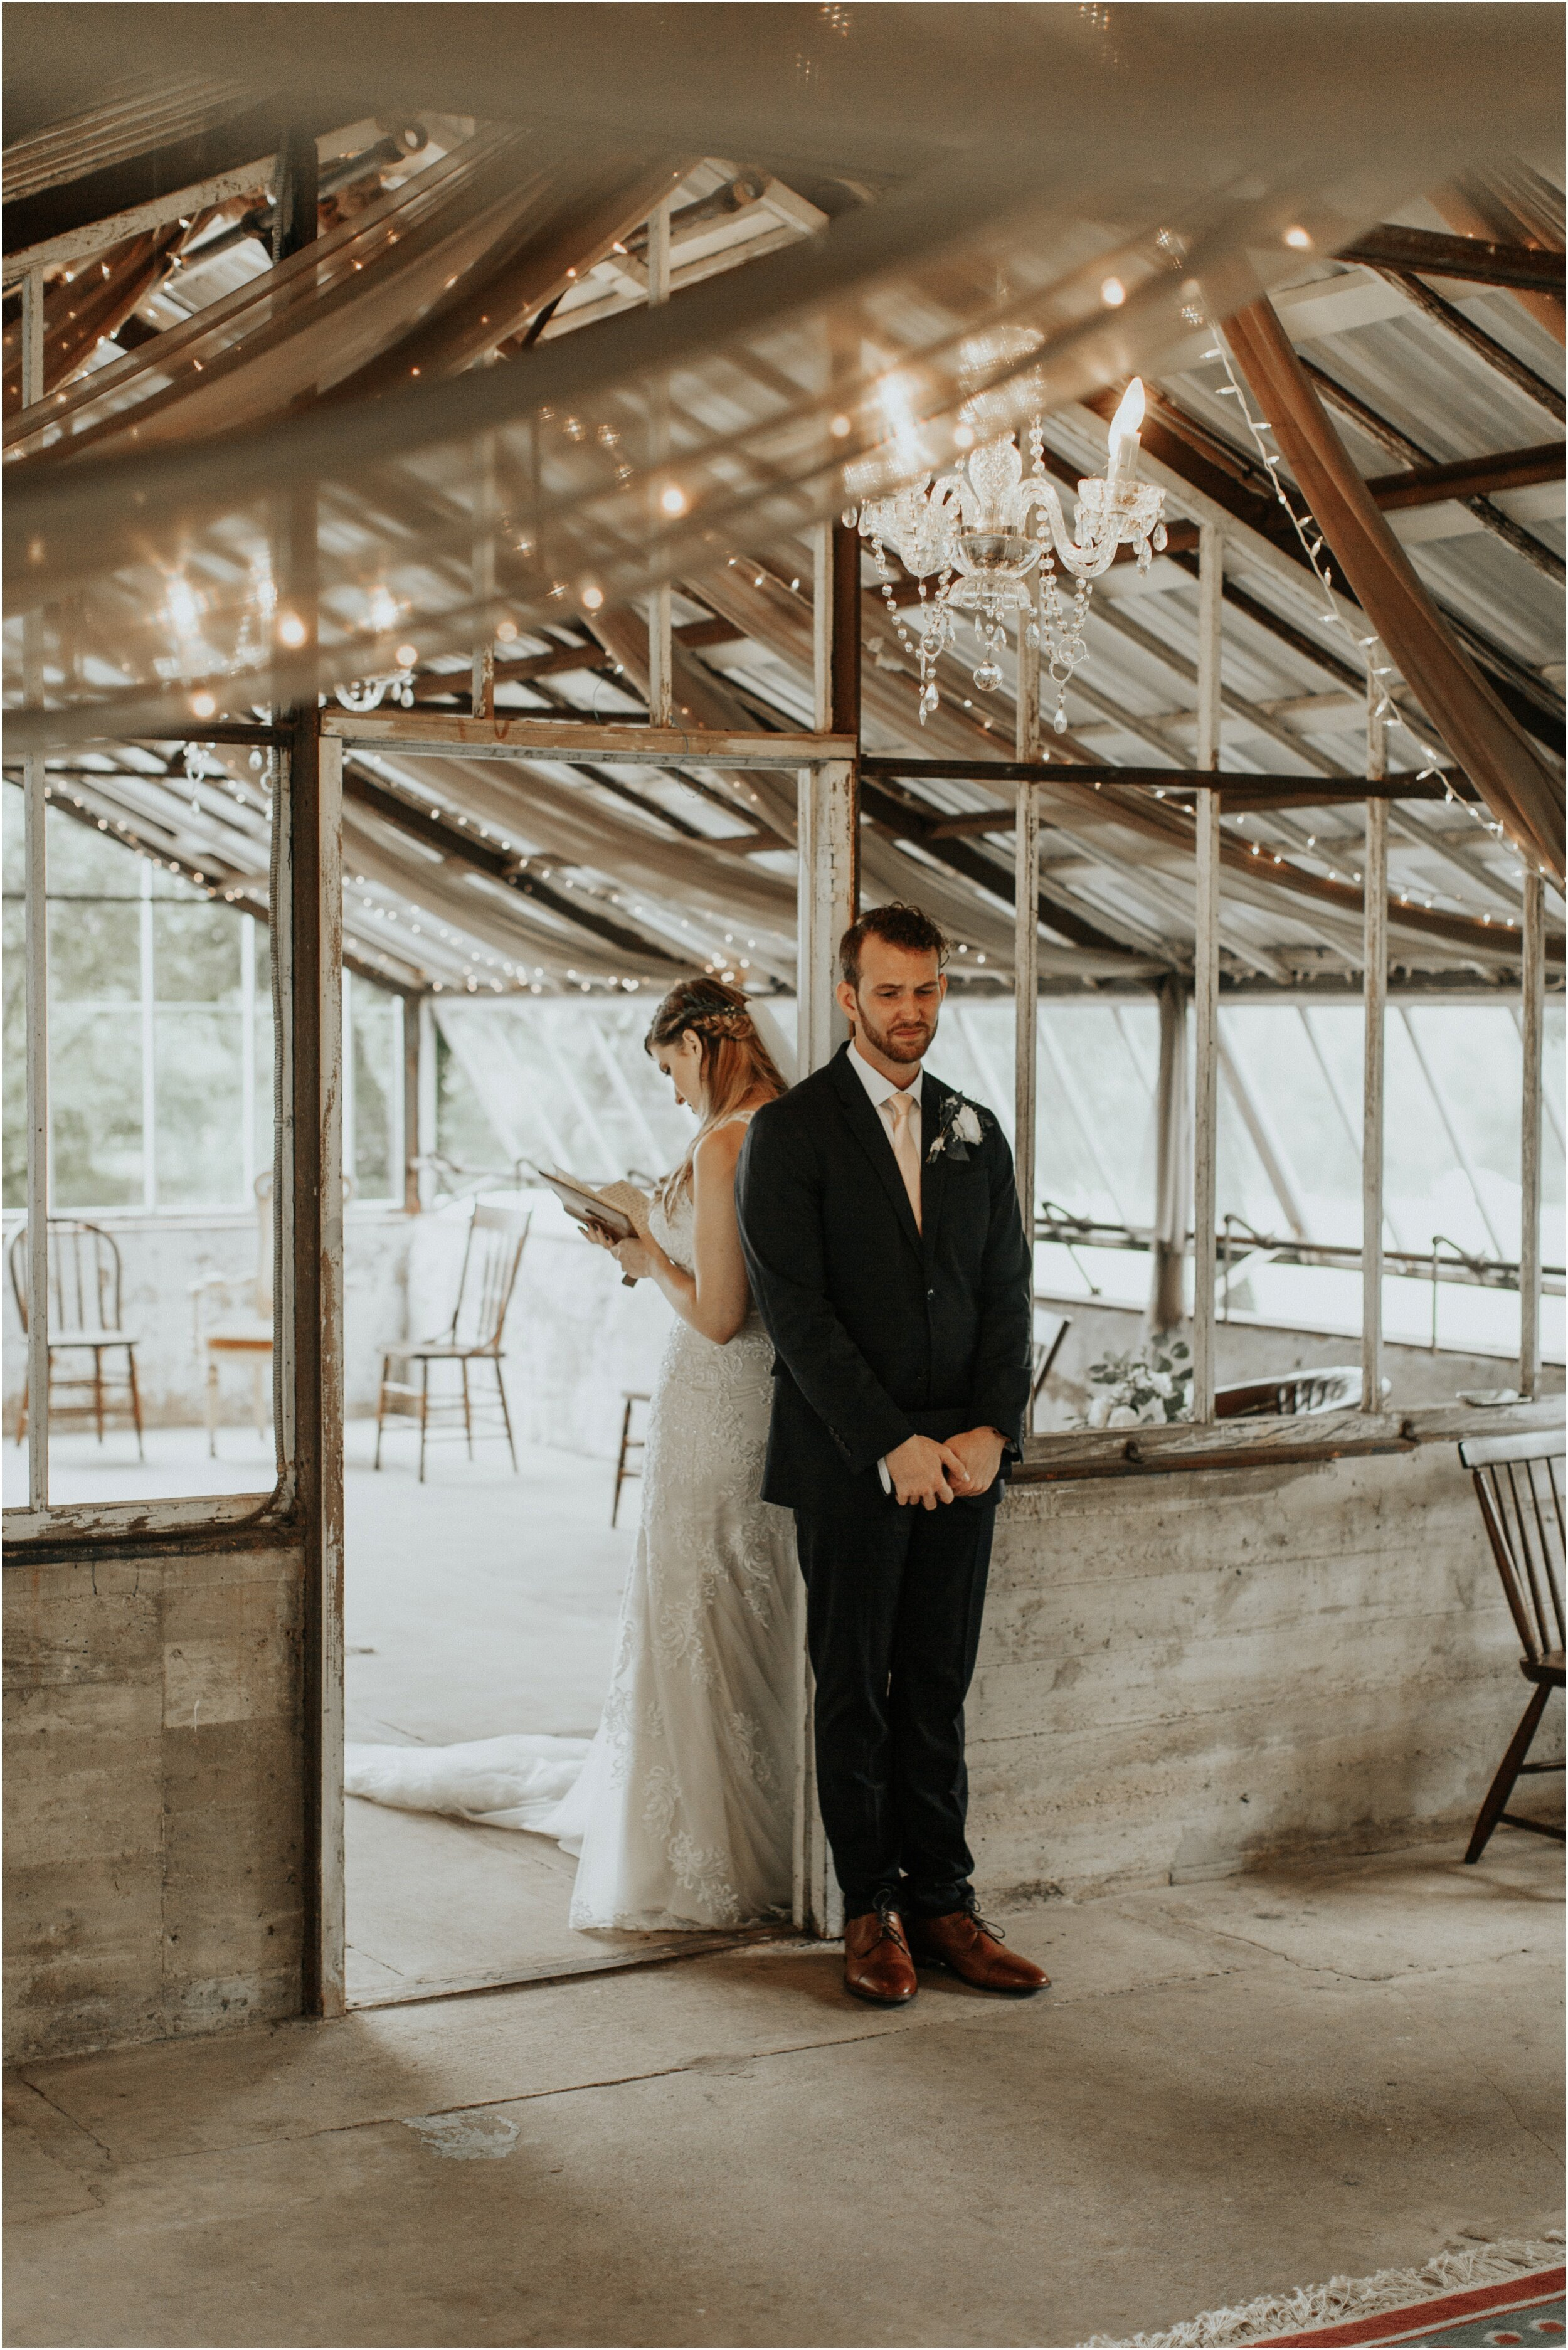 steph-and-jordan-cox-our-wedding-historic-shady-lane-compass-wedding-collective-hazel-lining-photography-destination-elopement-wedding-engagement-photography_0031.jpg